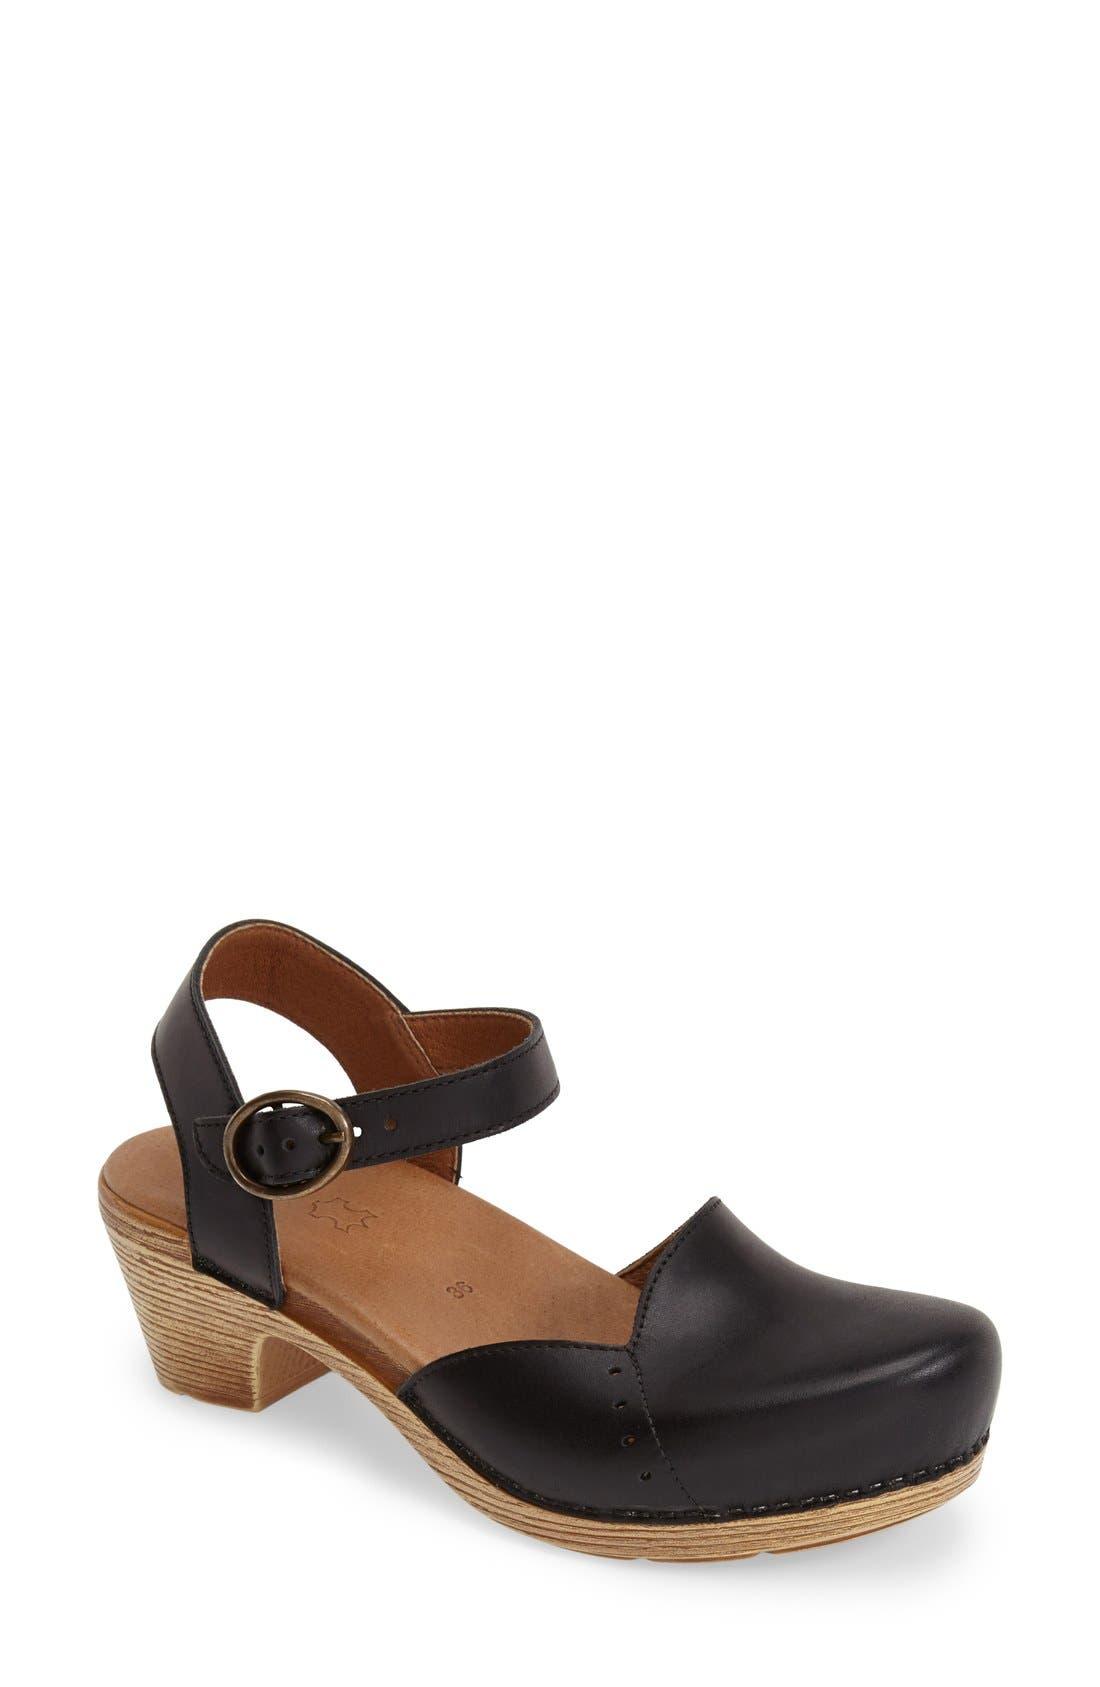 'Maisie' Ankle Strap Leather Pump,                         Main,                         color, 001